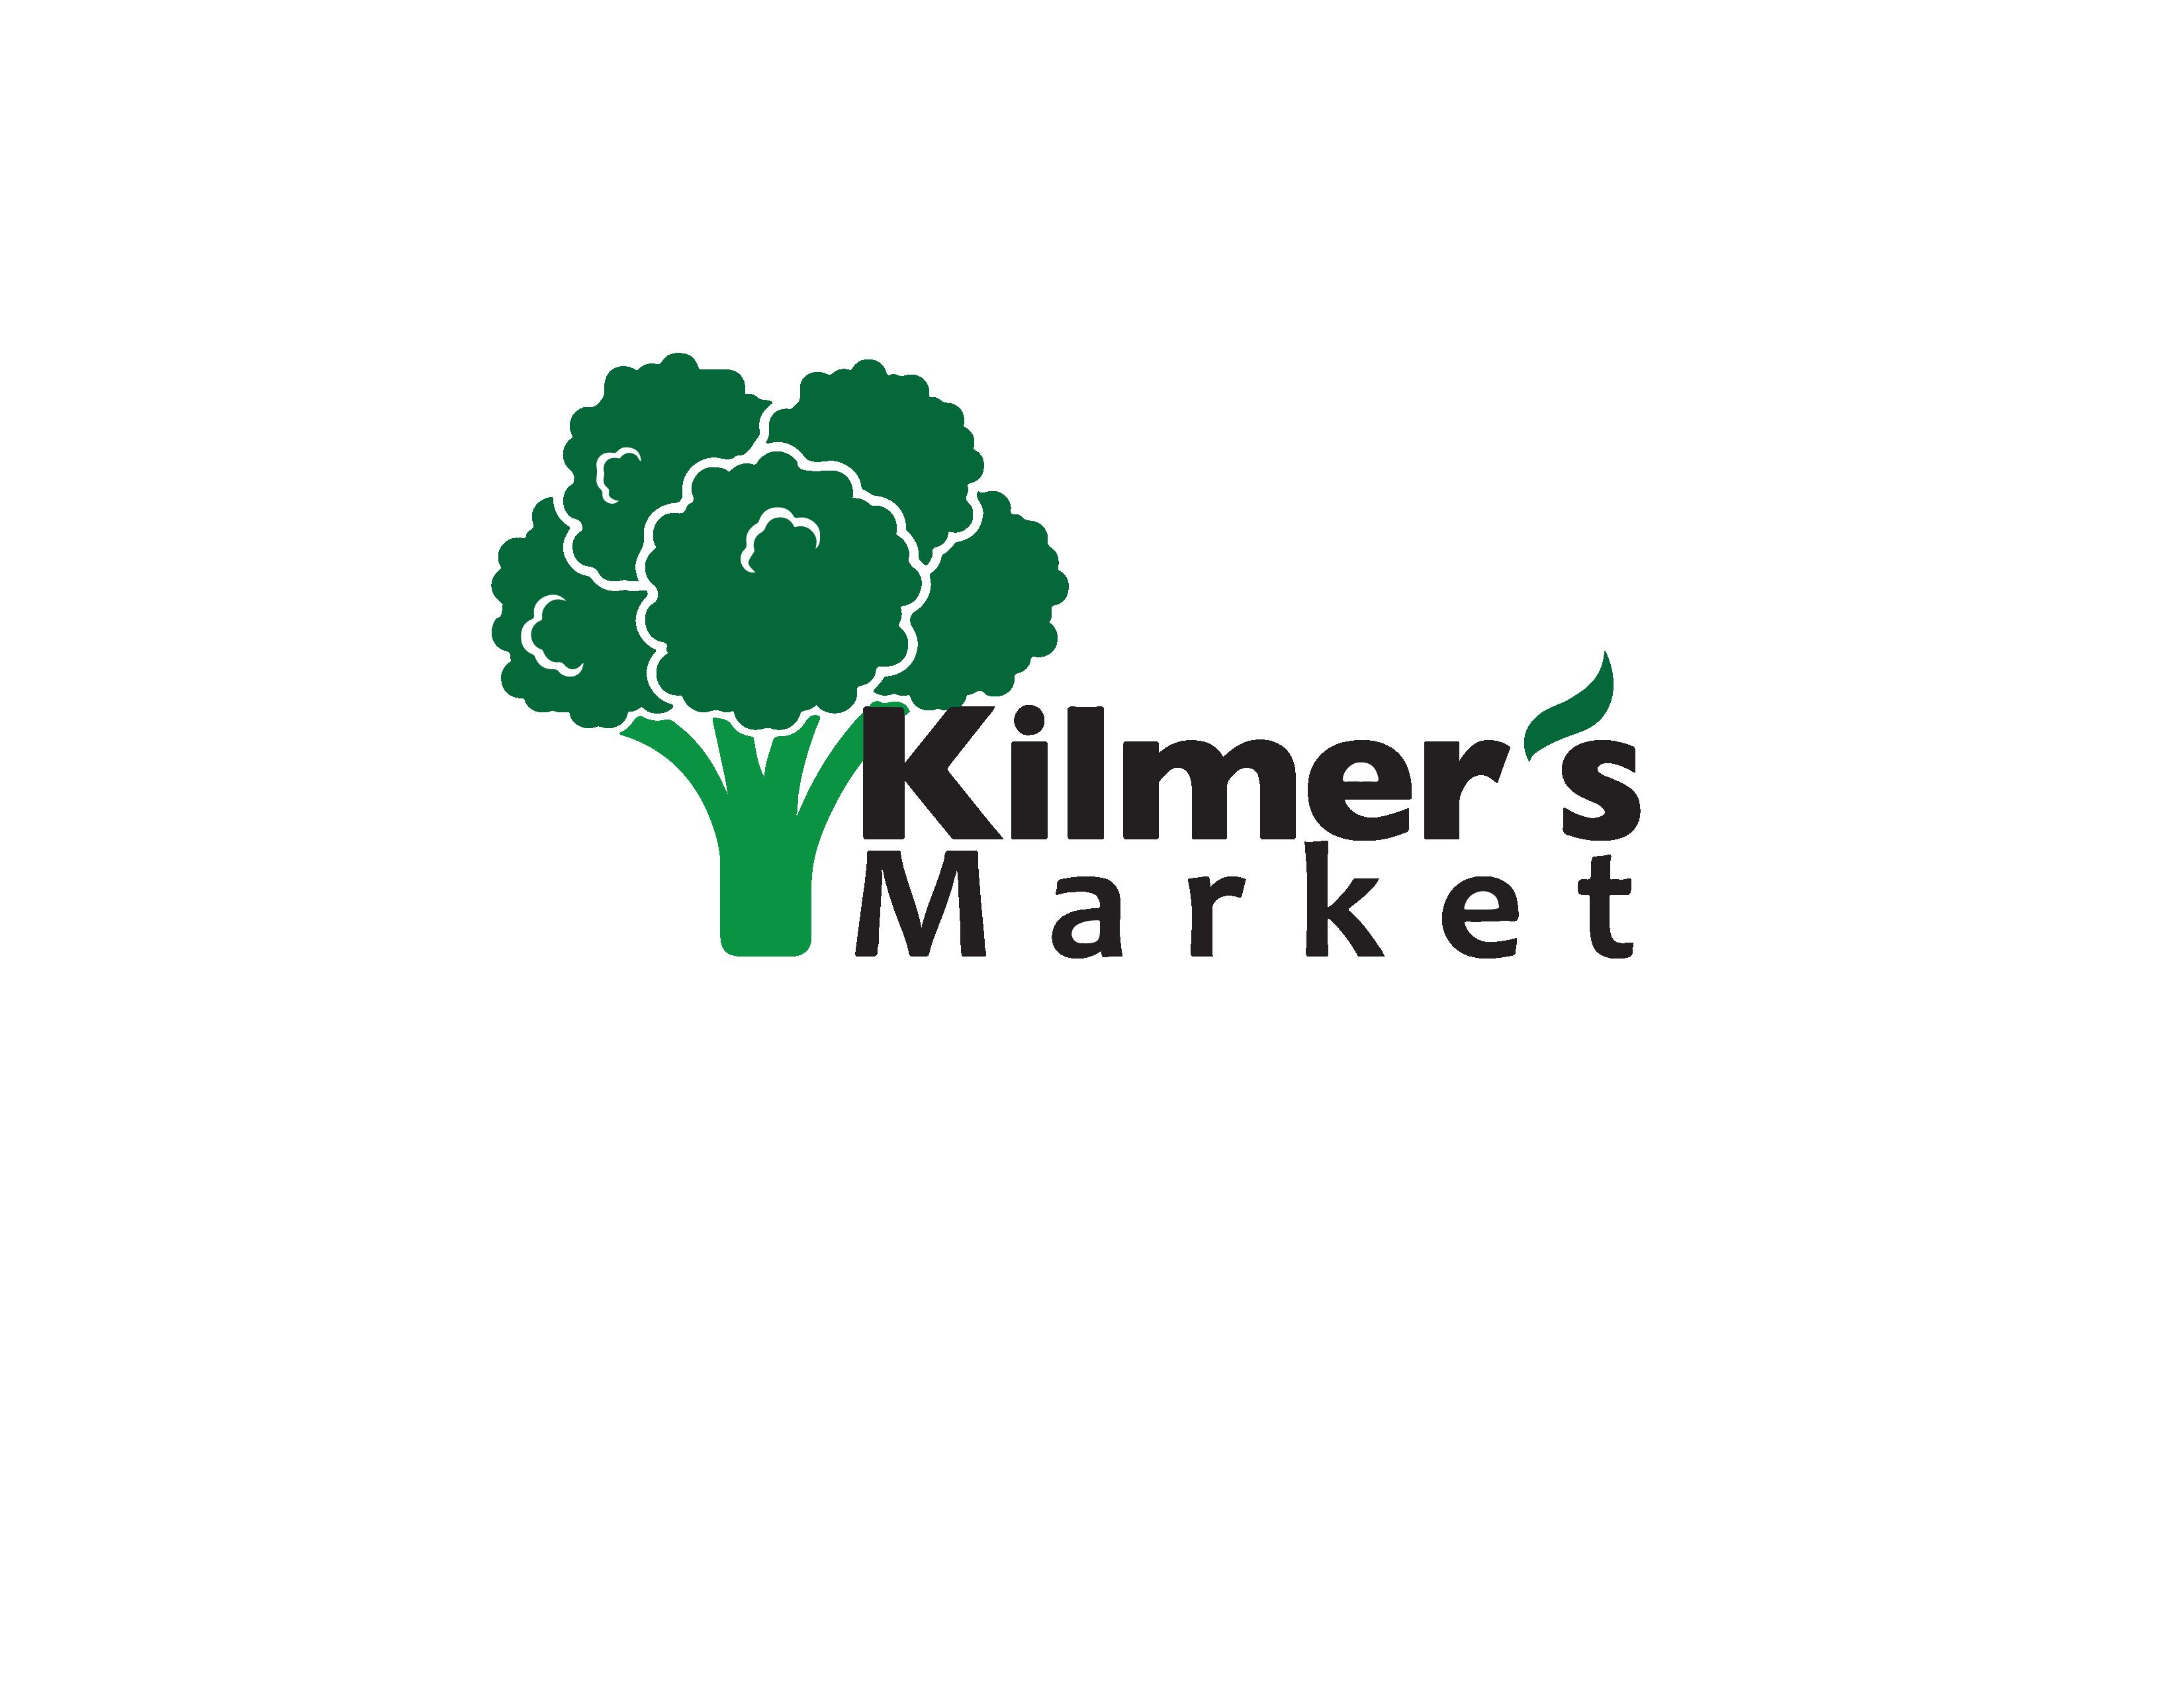 Kilmer's Market